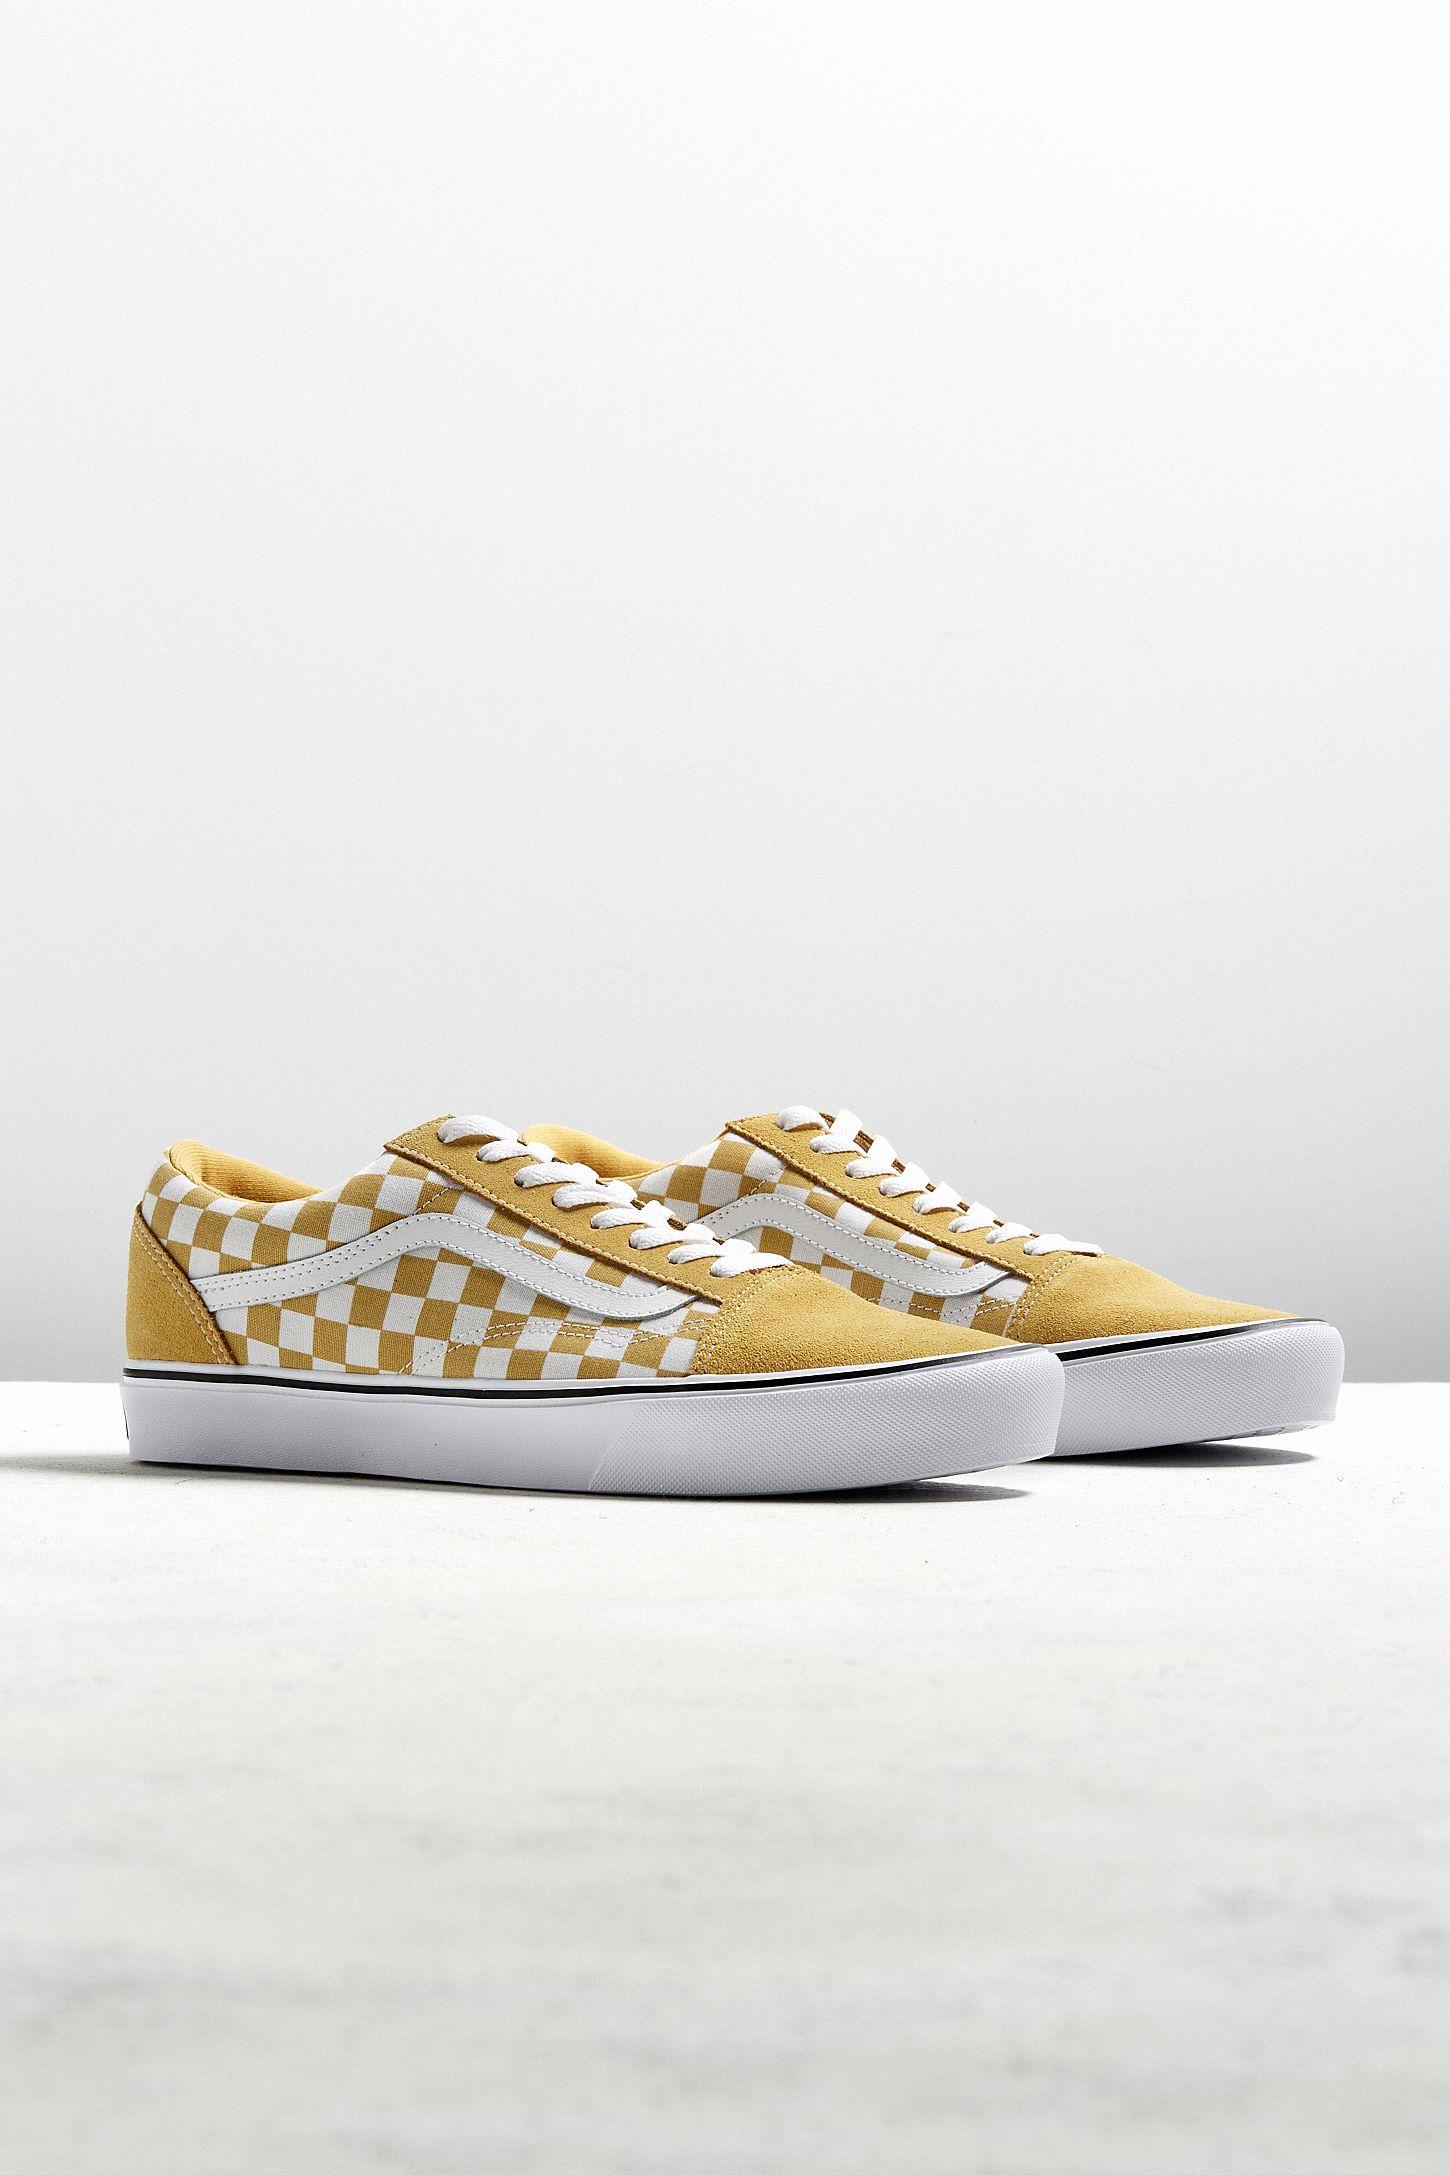 6e8b65d7e08 Vans Old Skool Lite Checkerboard Sneaker